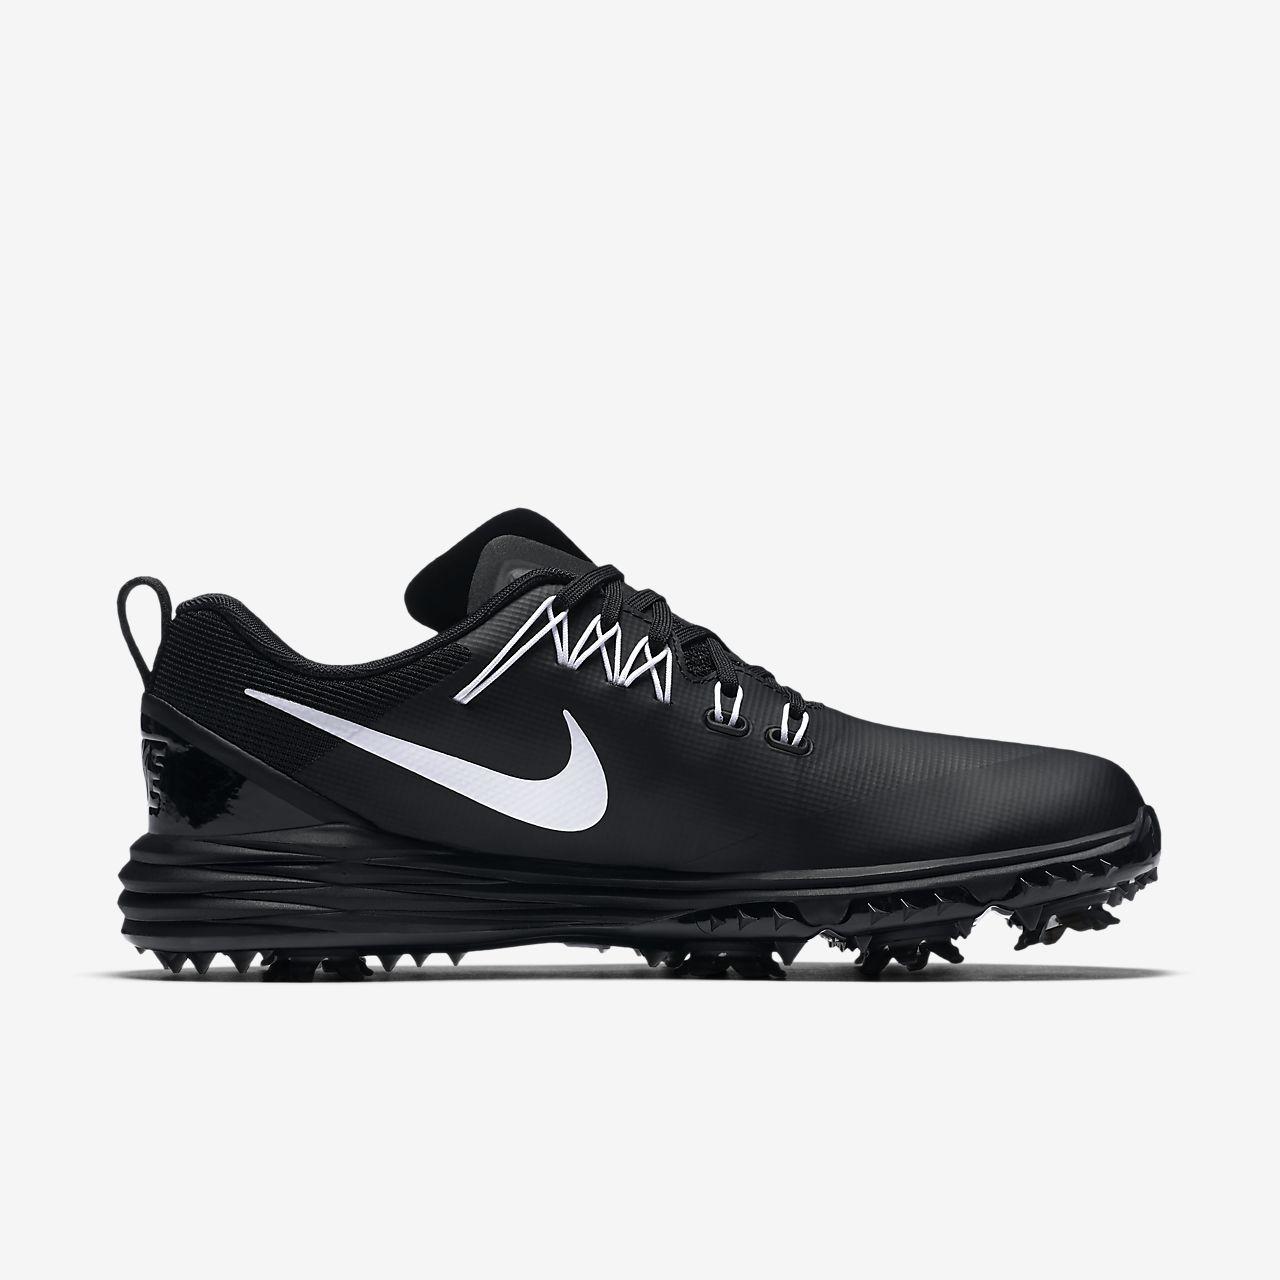 buy online aabbc 05b87 ... Scarpa da golf Nike Lunar Command 2 - Donna